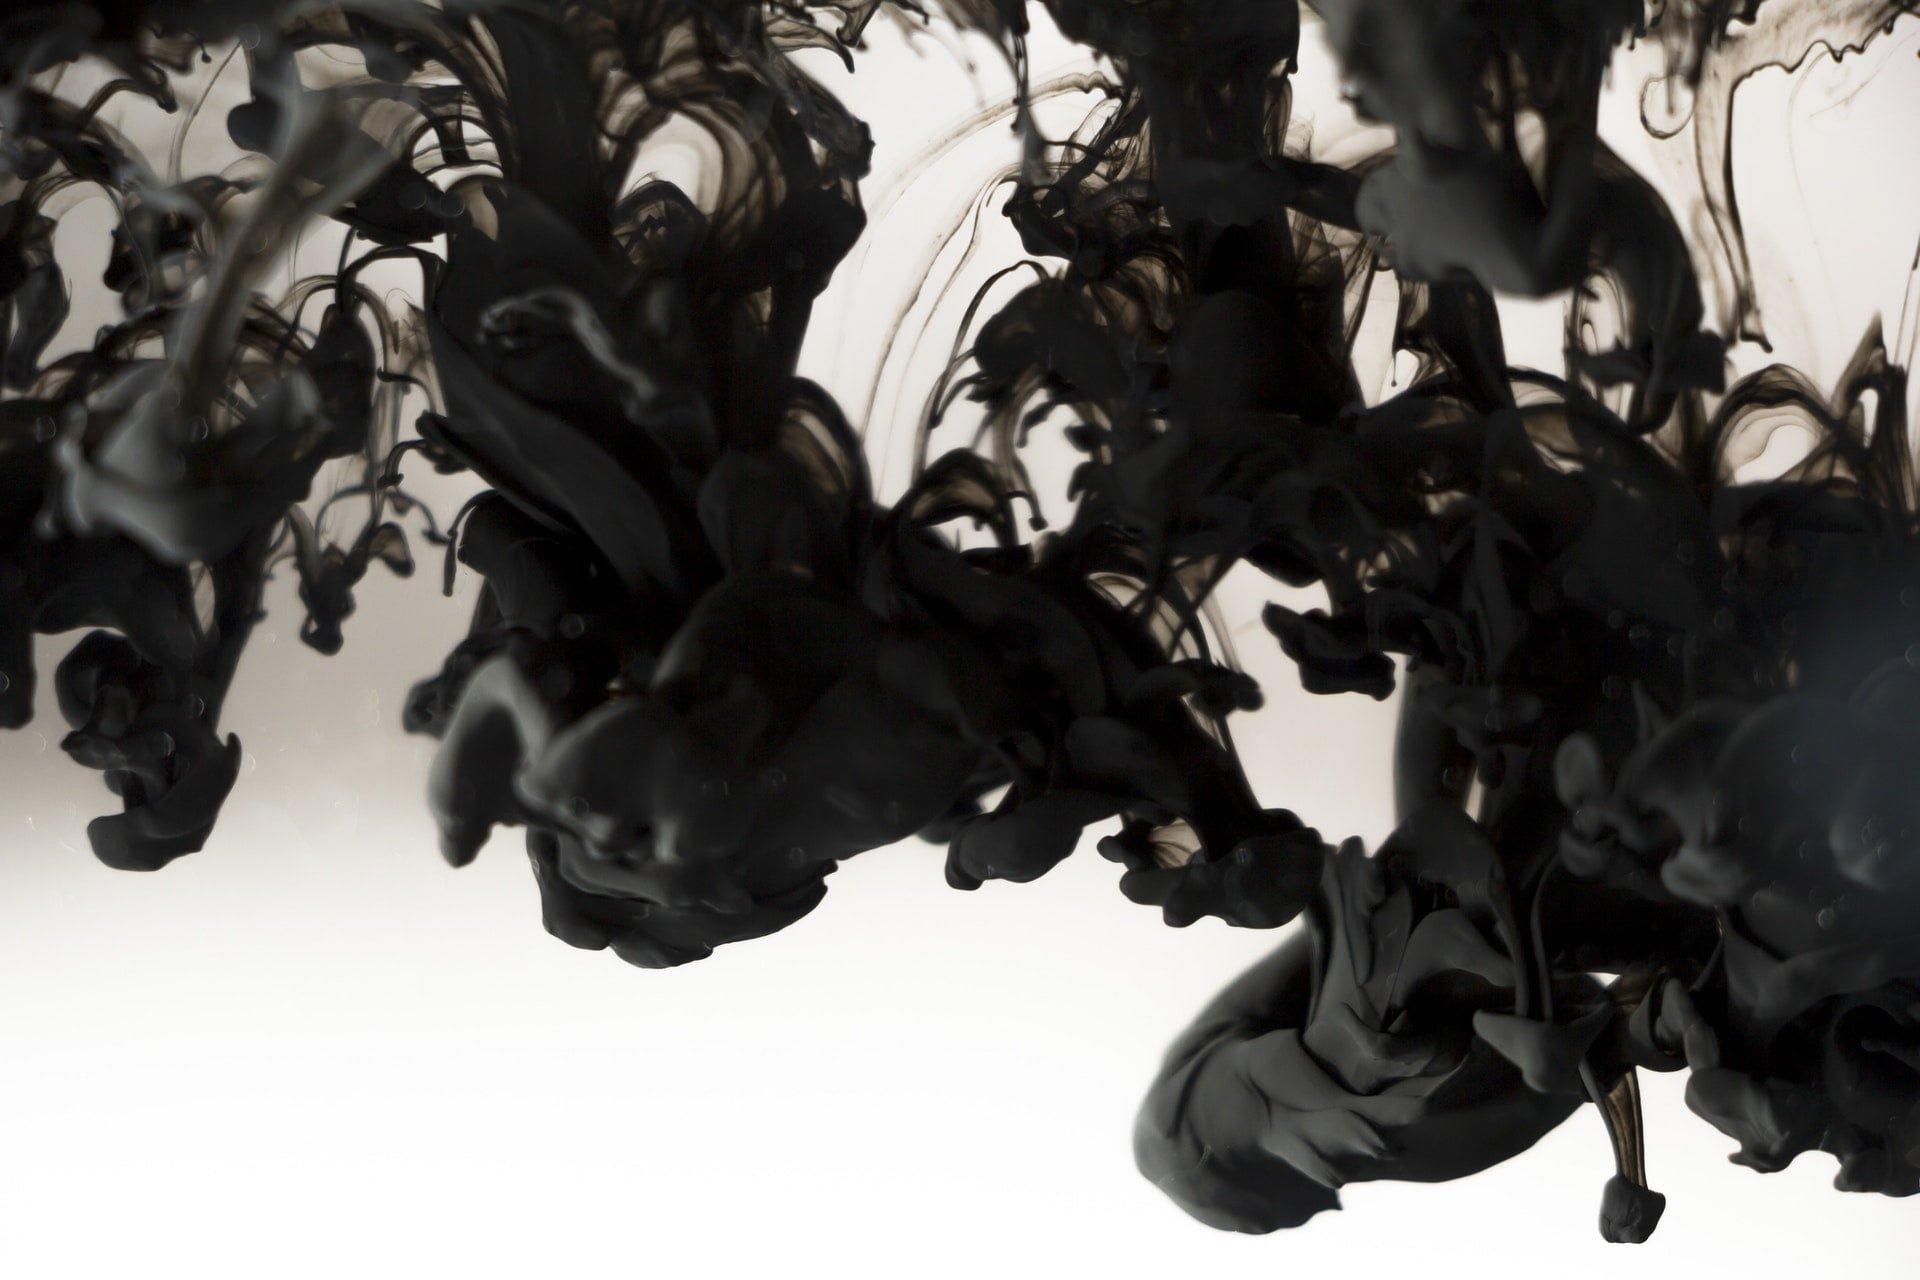 black smoke abstract water Pollution 促轉會口中「政治受難者」真的都是無辜民眾嗎?